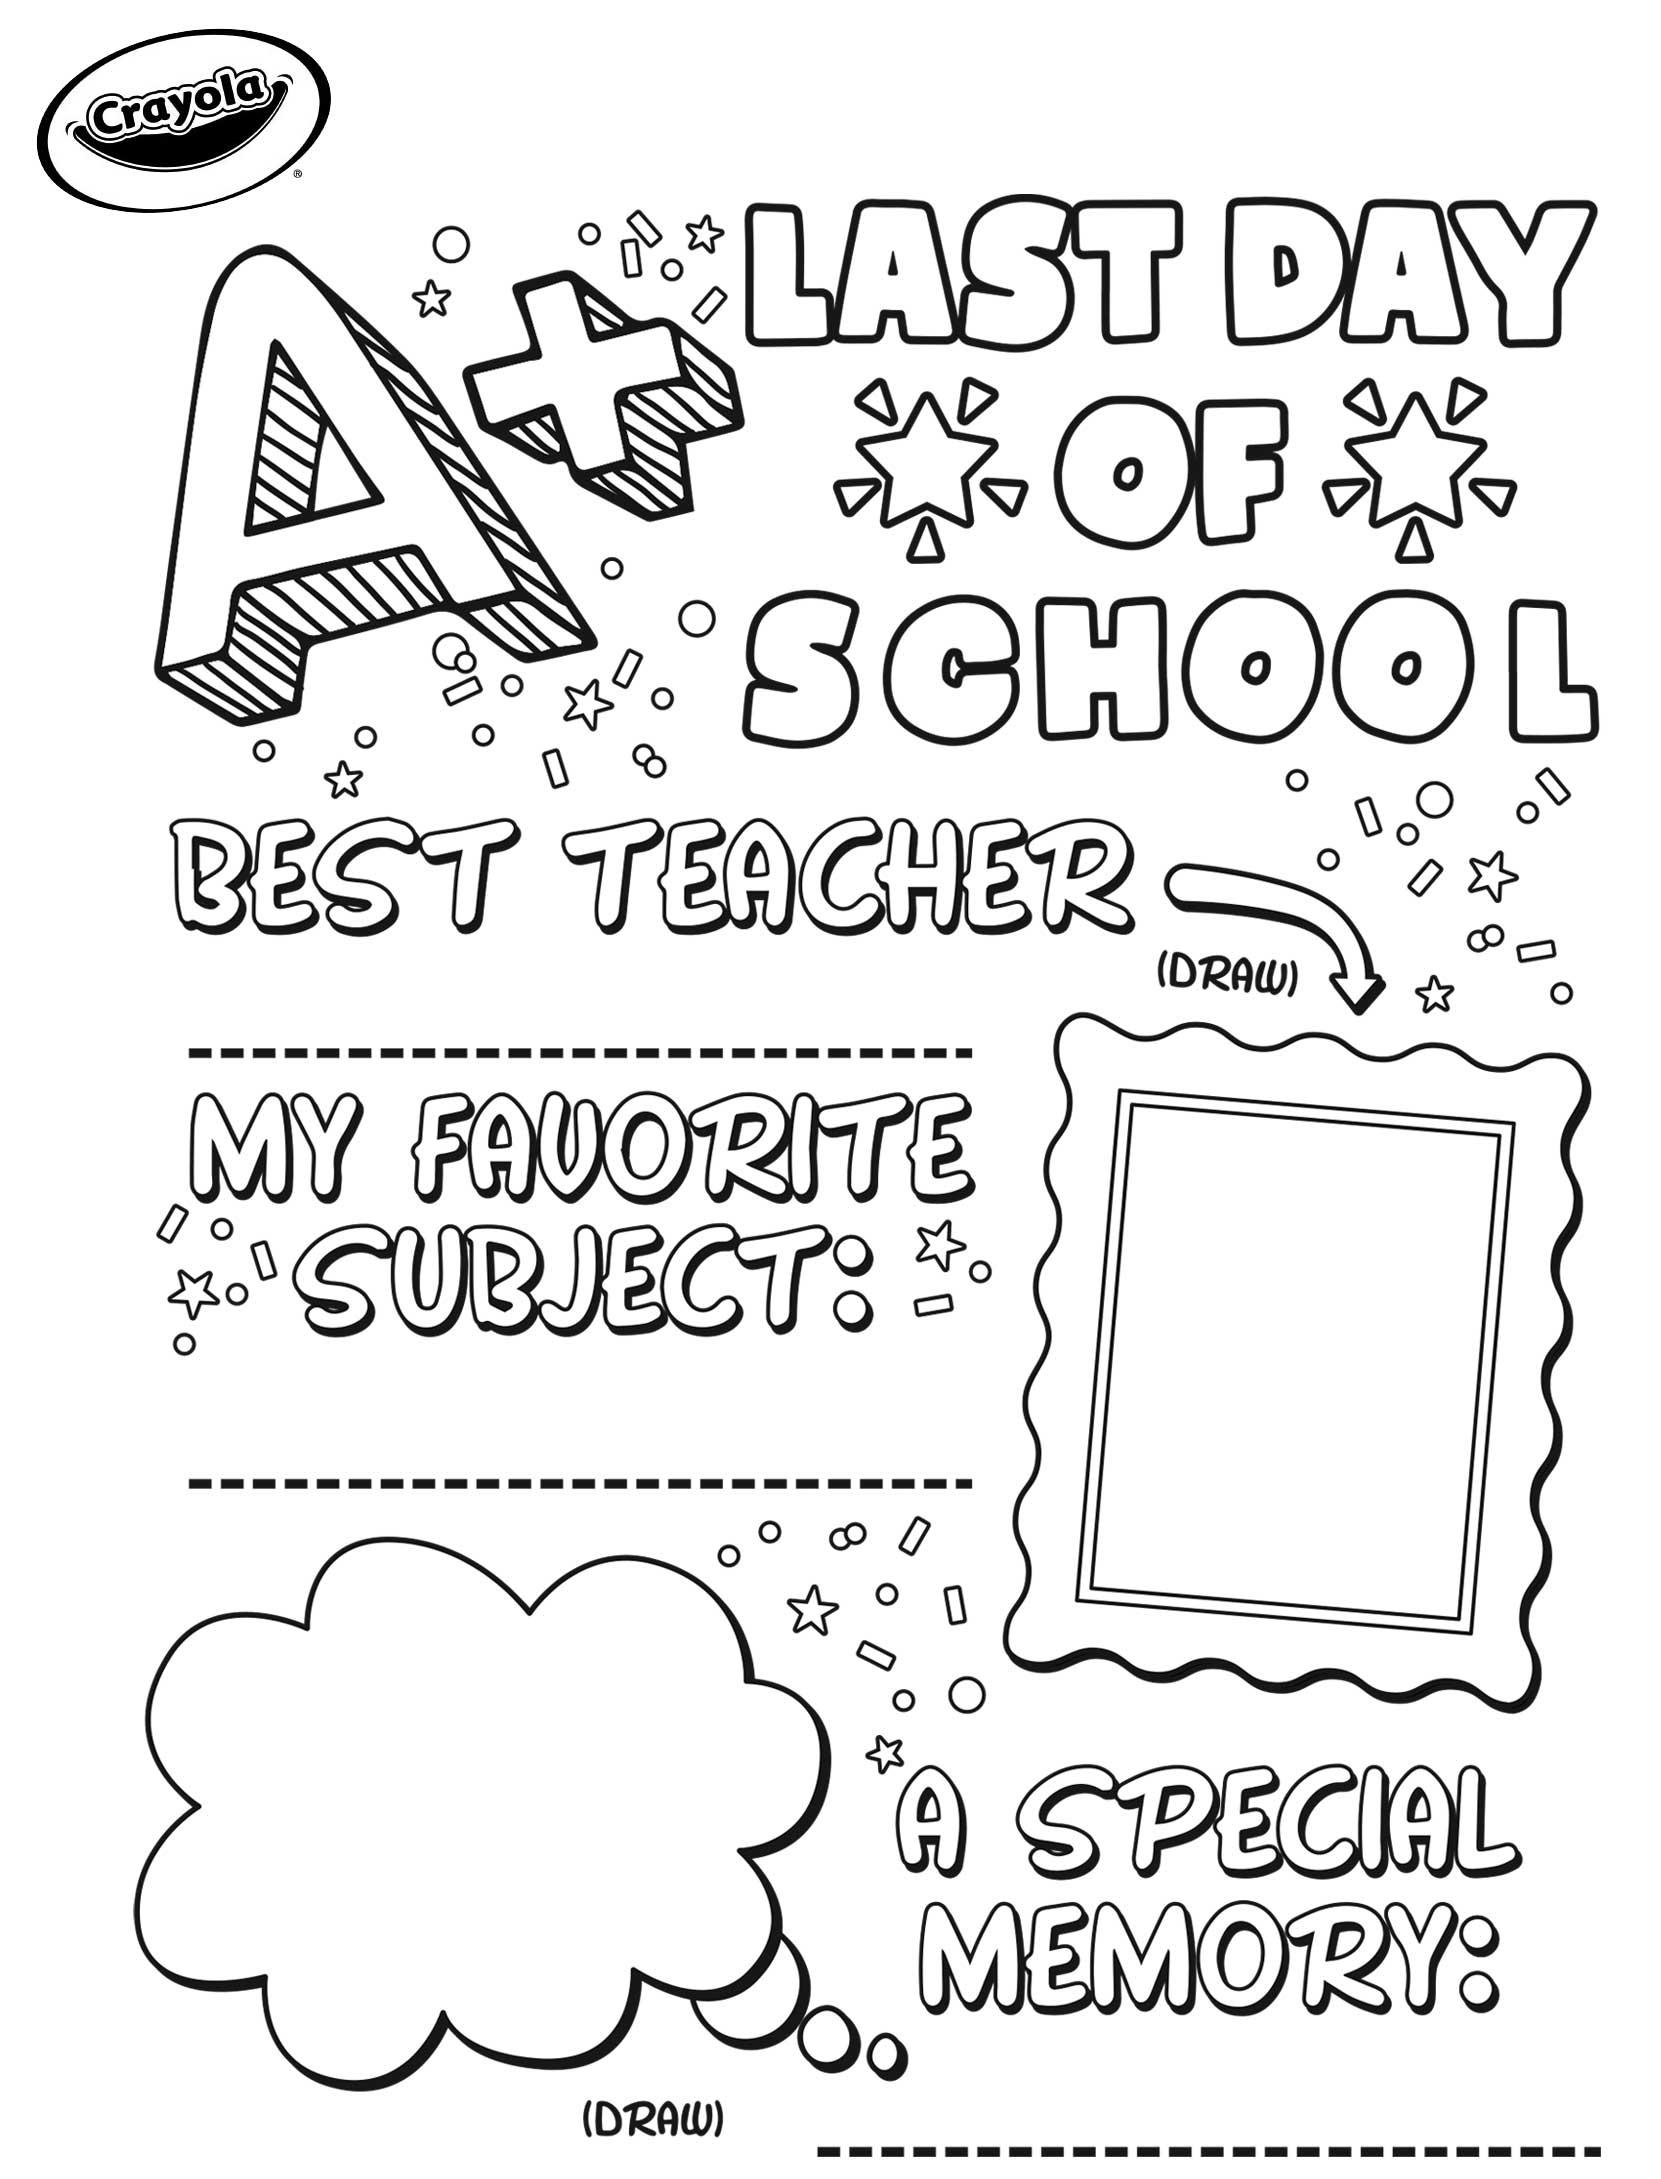 Last Day Of School Sign Crayola.com